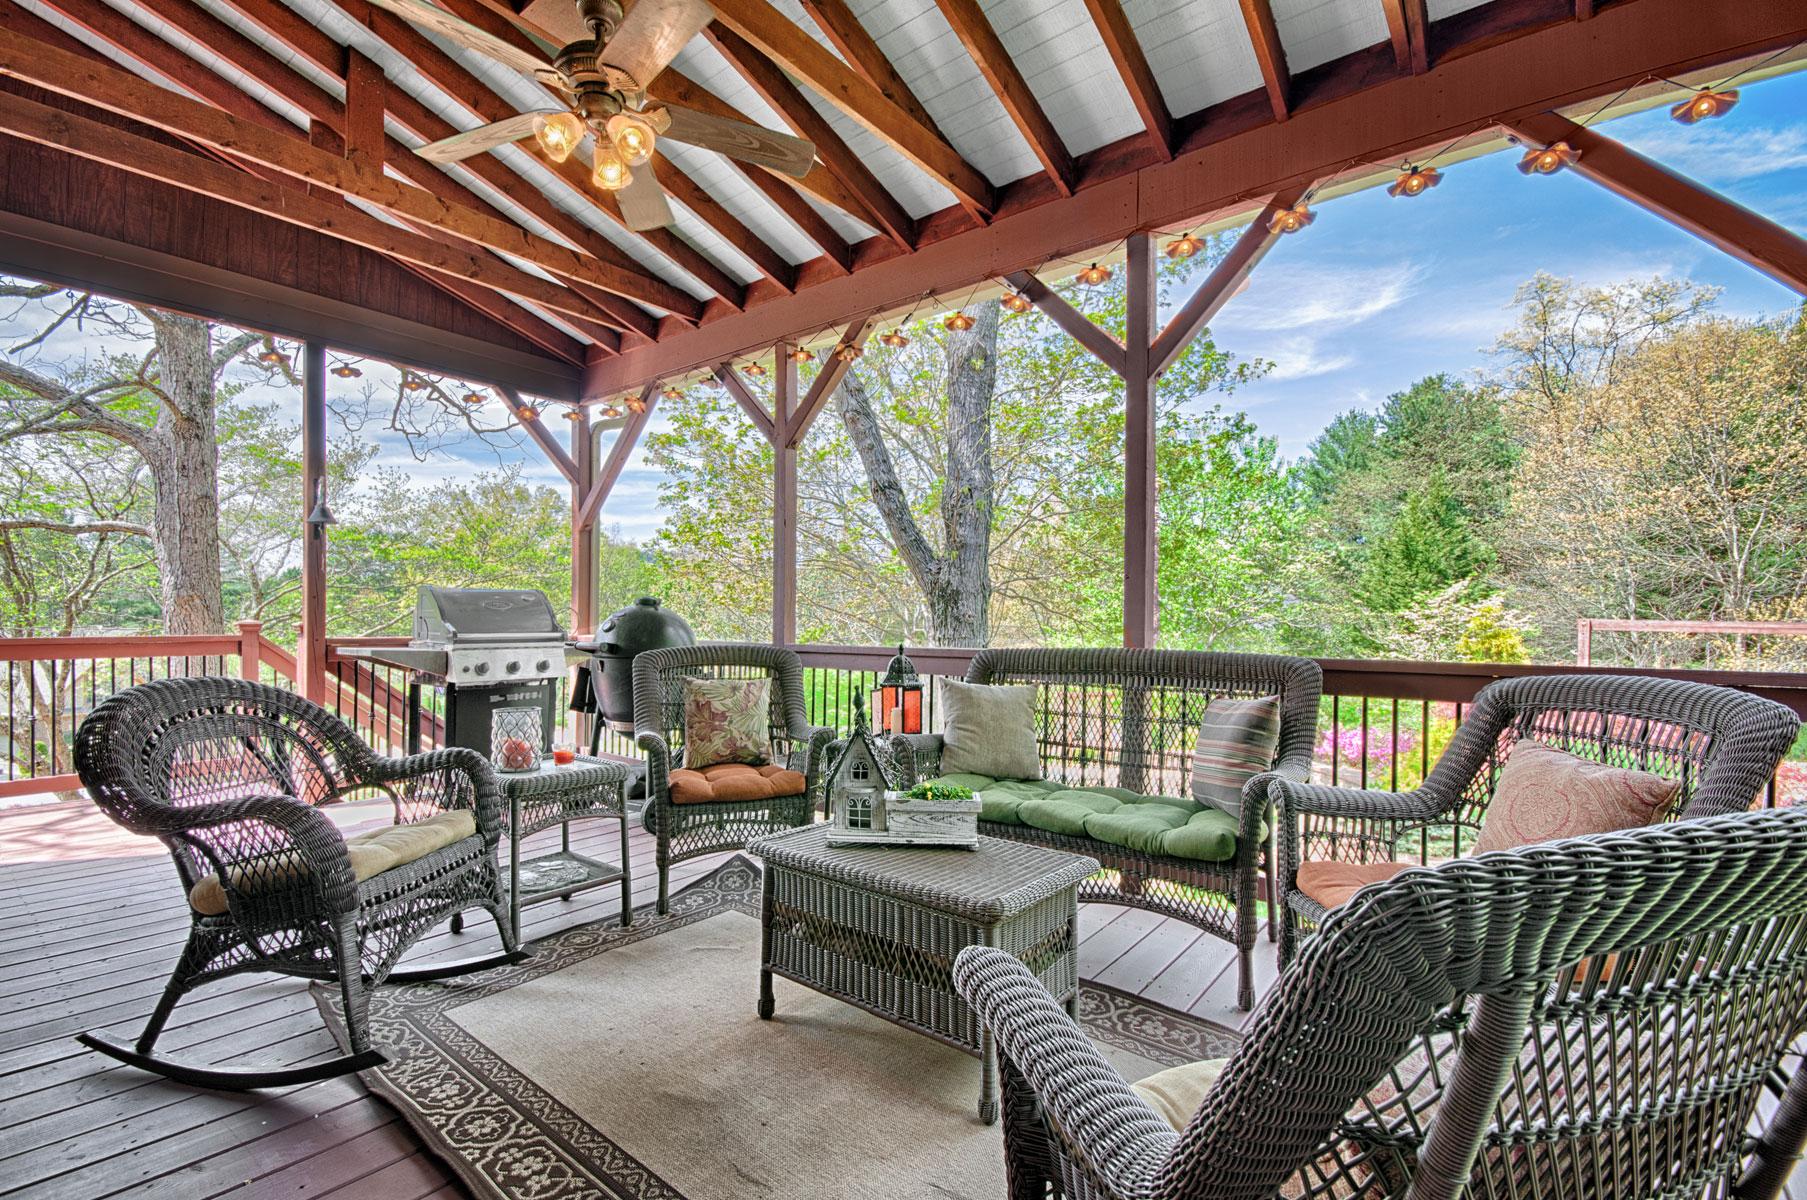 Covered deck overlooking backyard